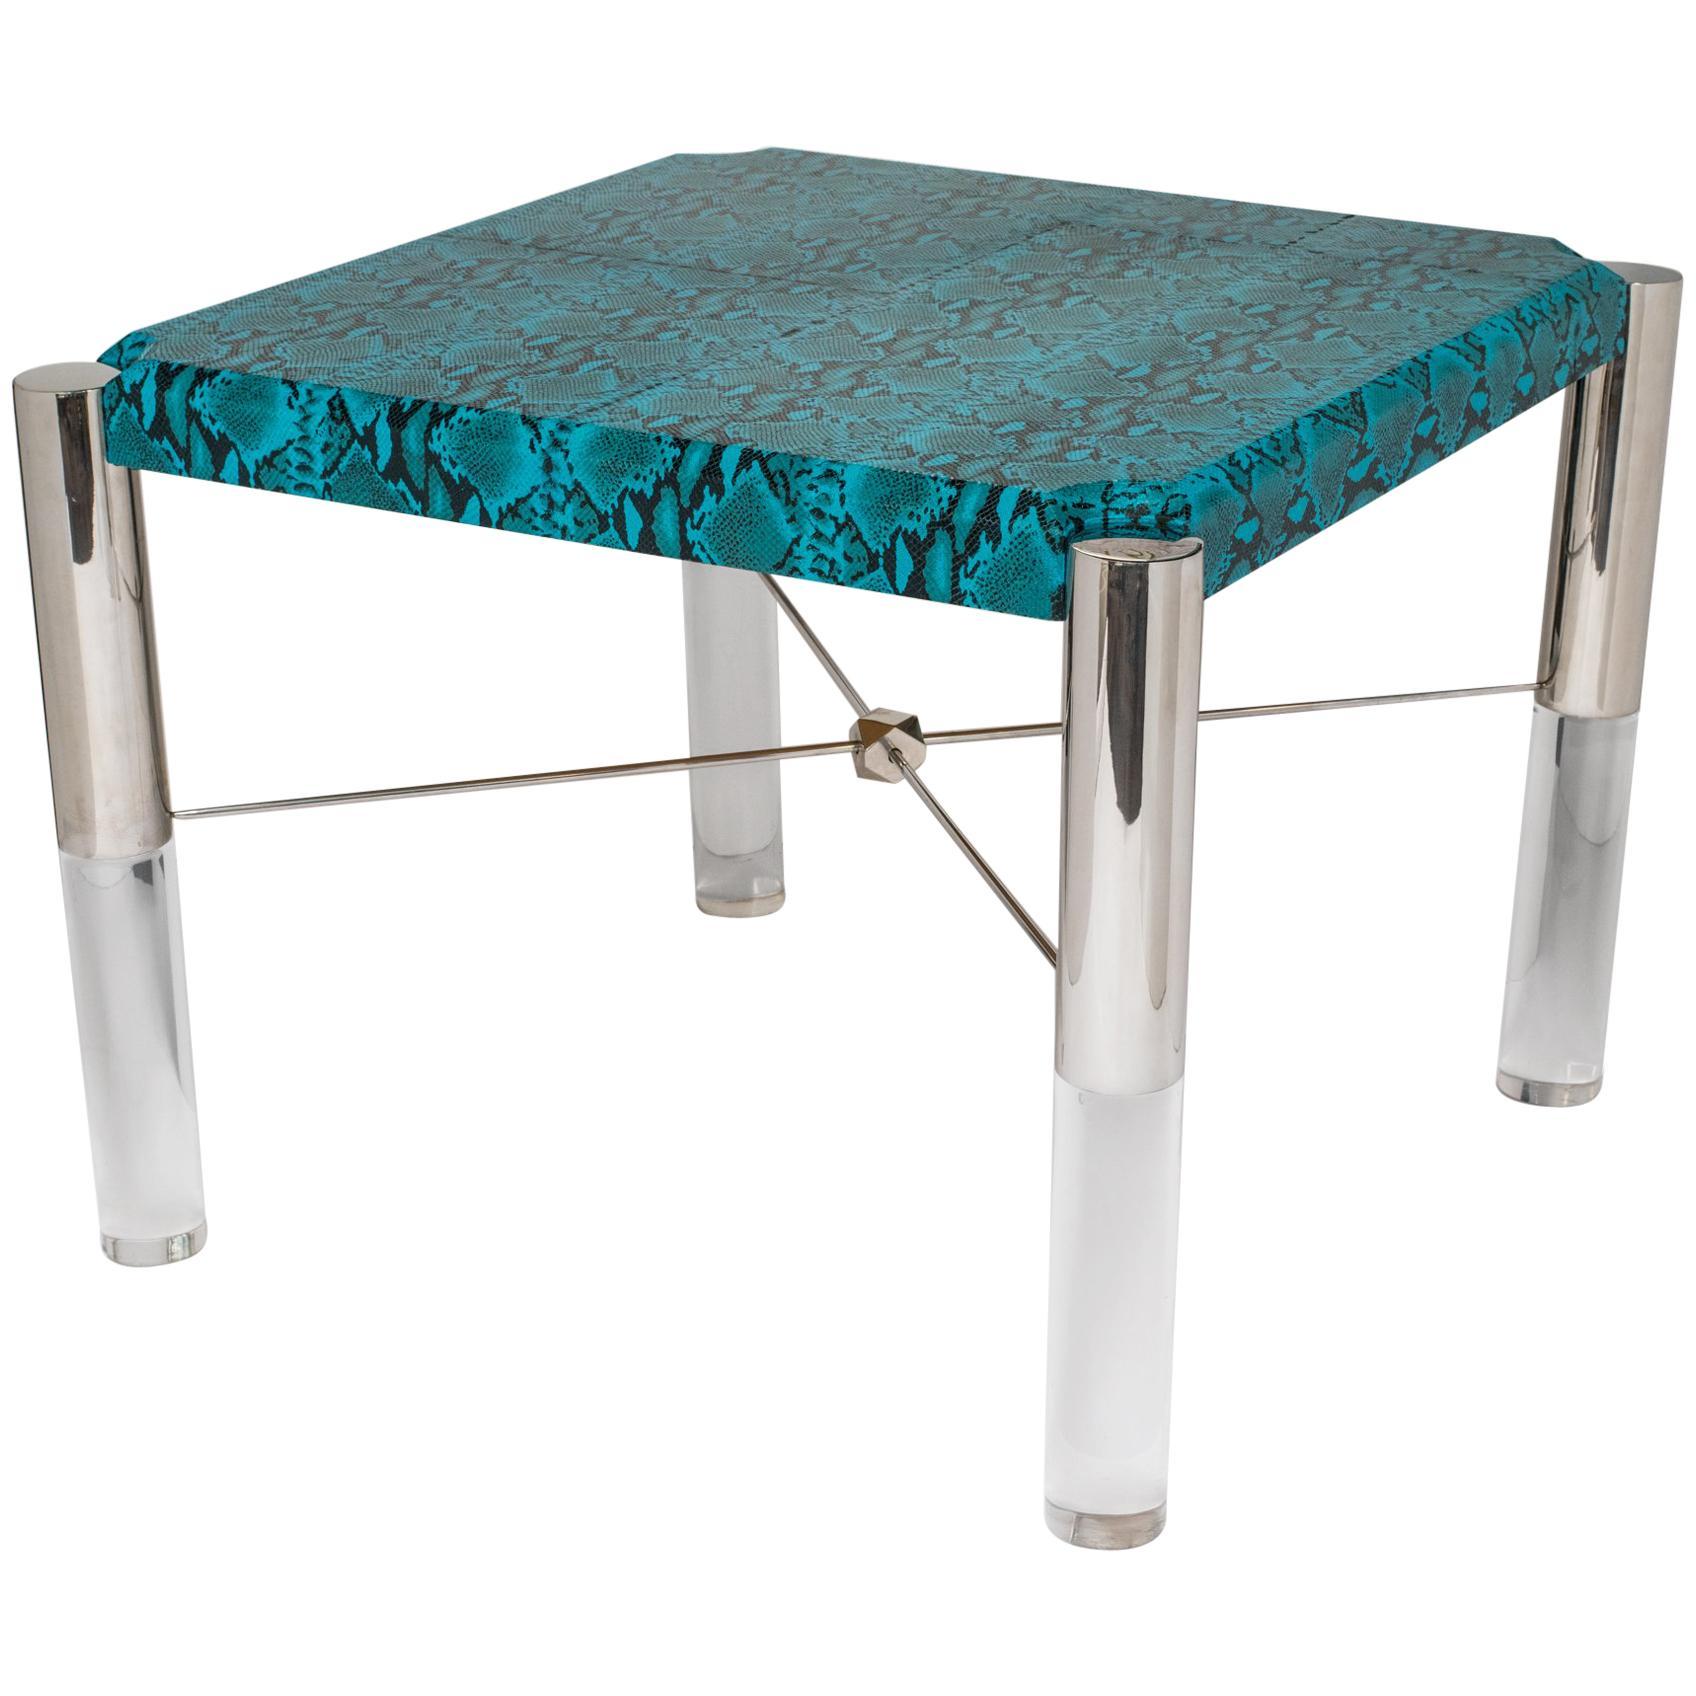 1970s Mid-Century Modern Turquoise Snakeskin Game Table